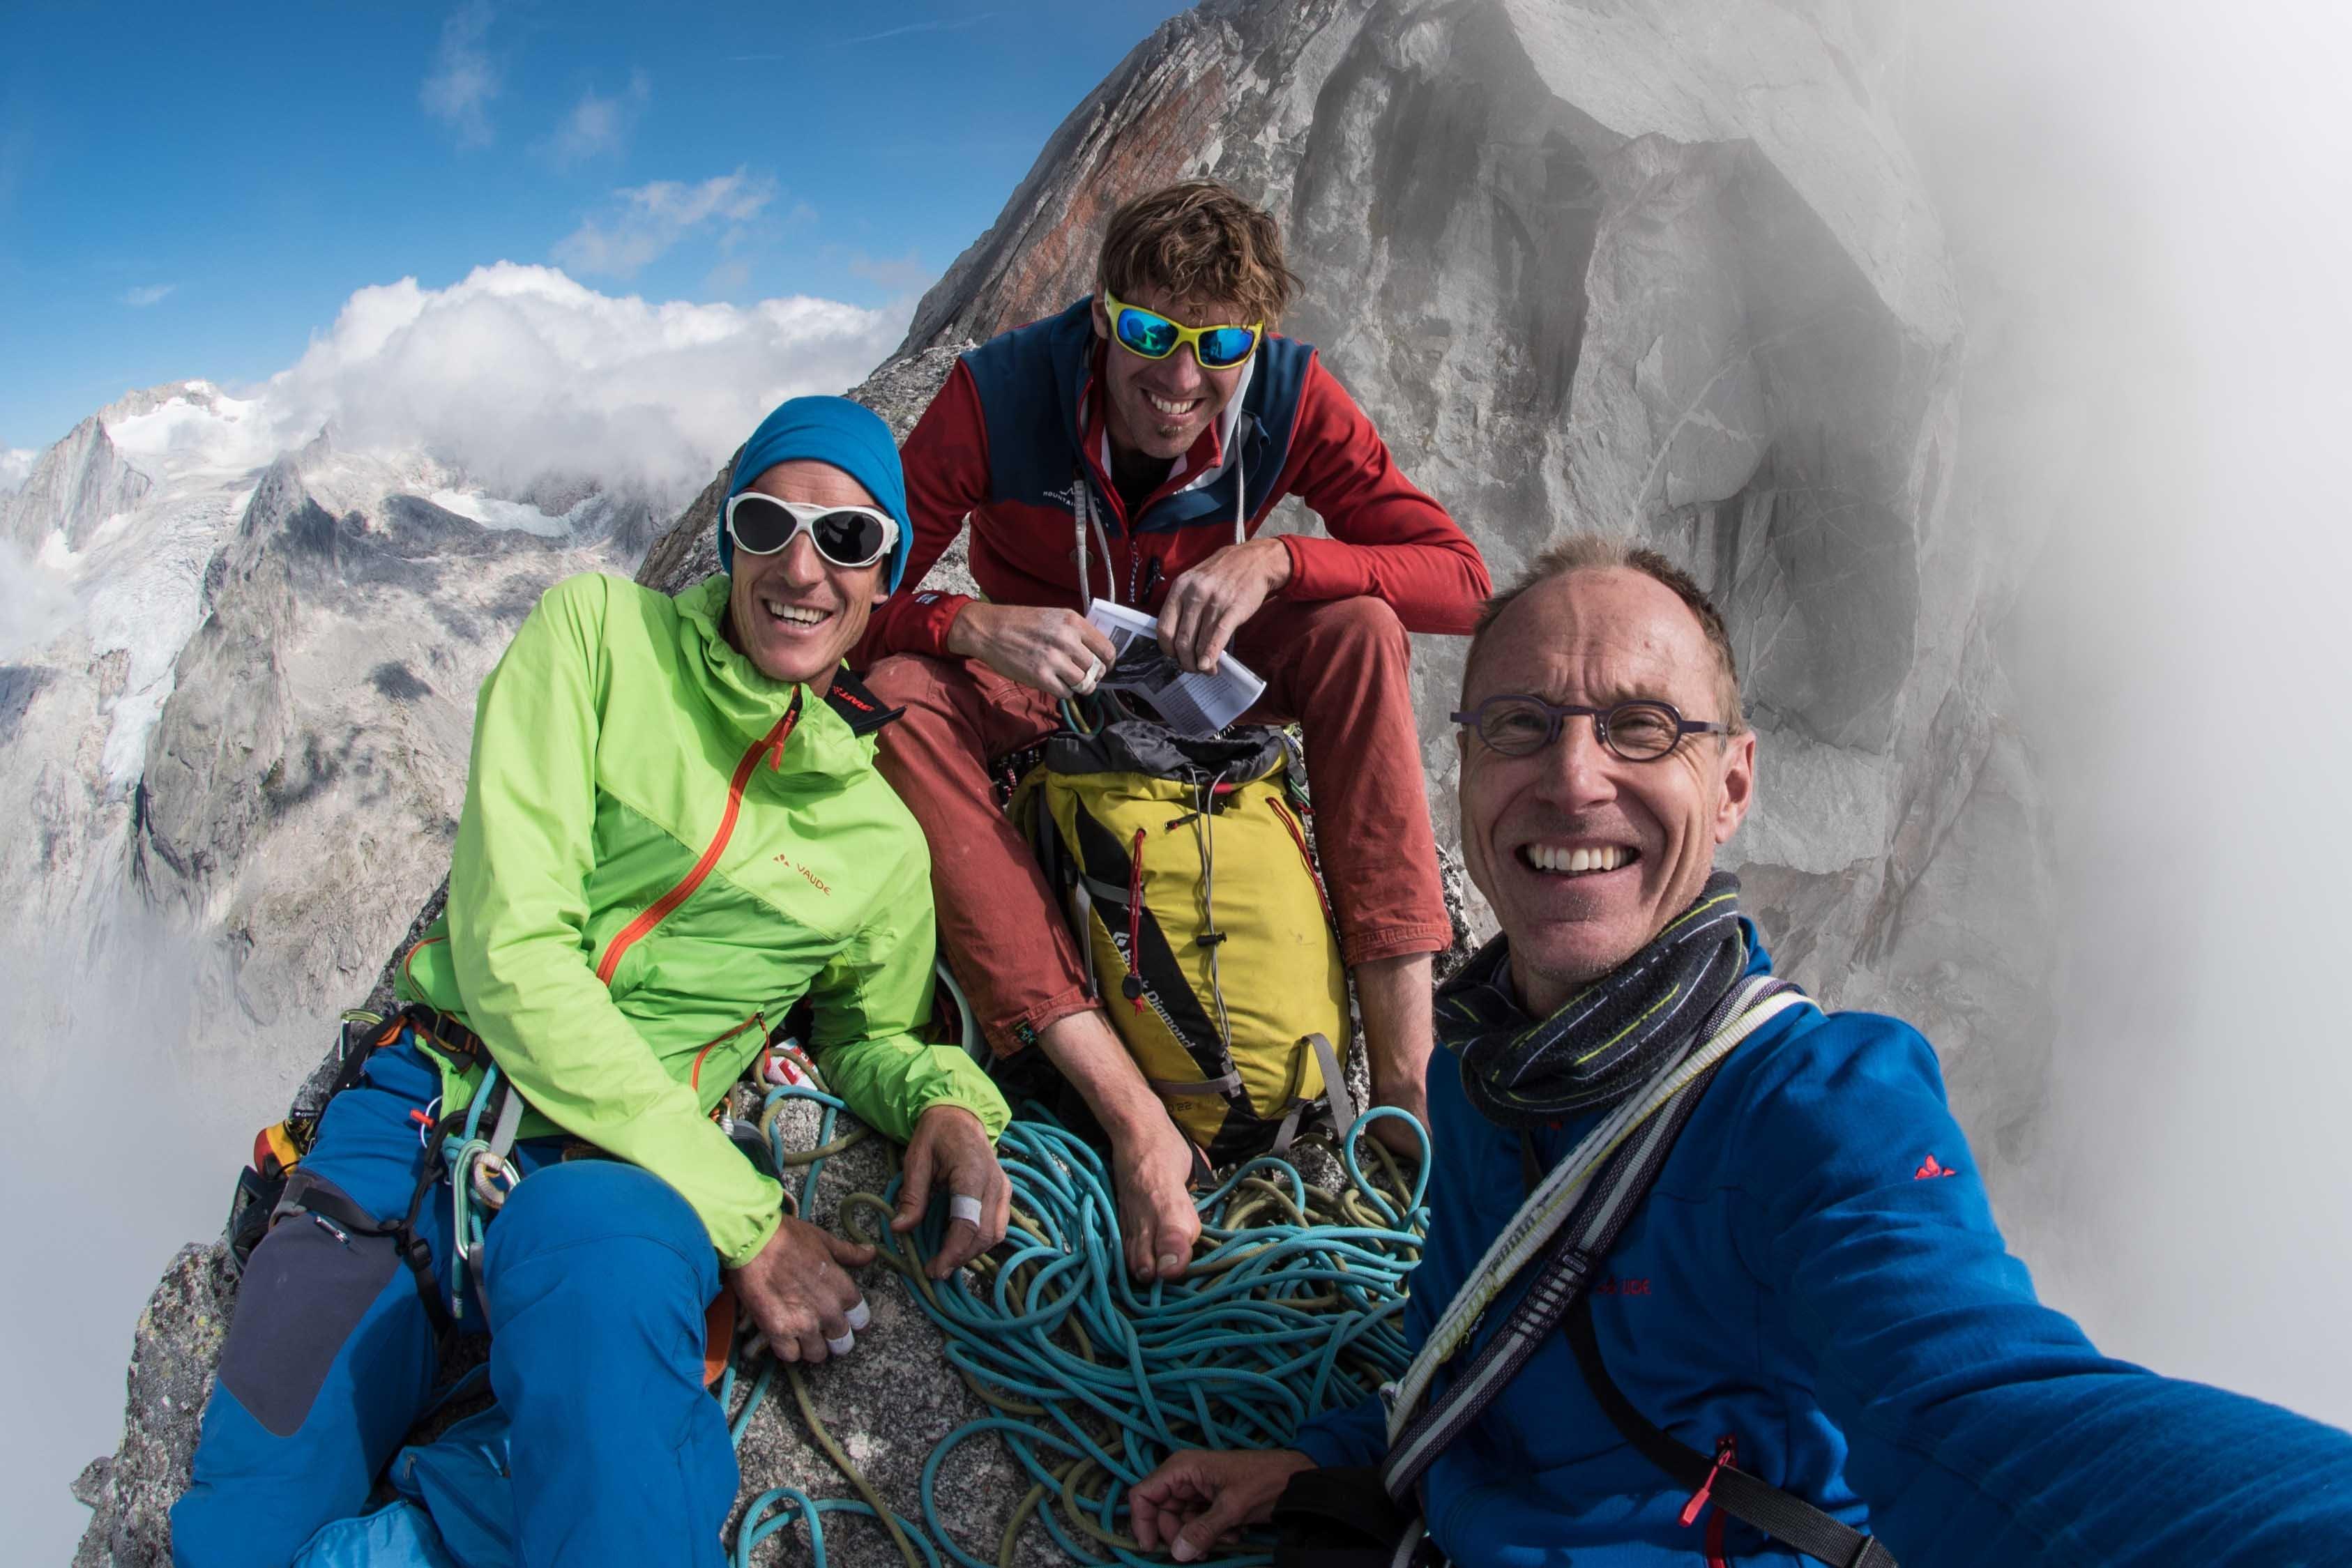 Bergell Alpinklettern, Bergell Alpin, Granit Schweiz, Guide Bergell, Bergführer Bergell